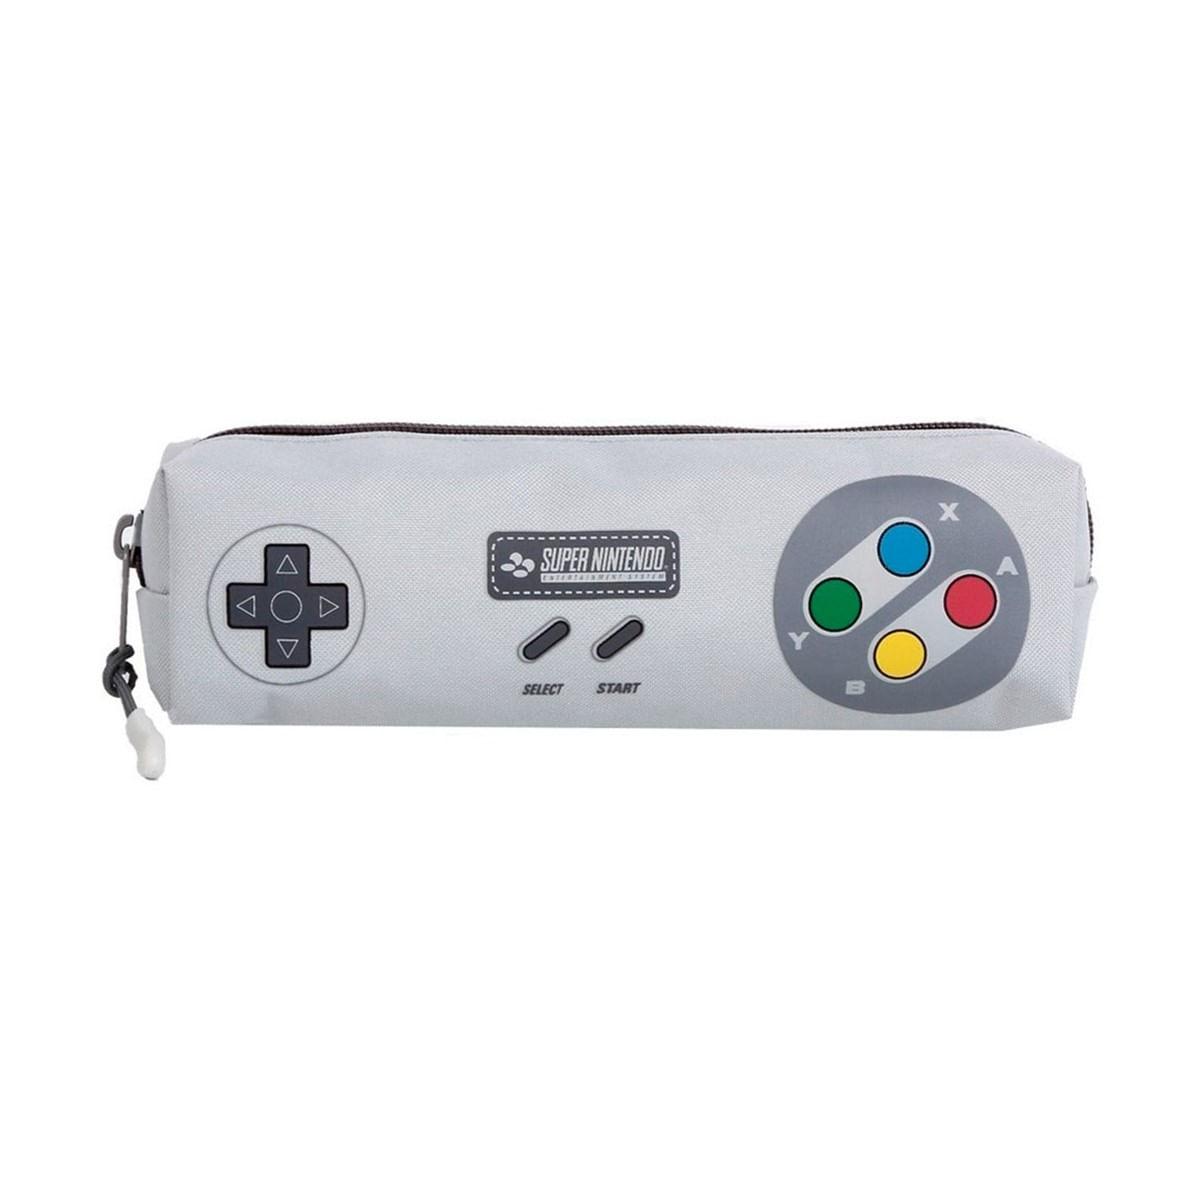 Estojo-Soft-Infantil-Super-Nintendo-Joystick